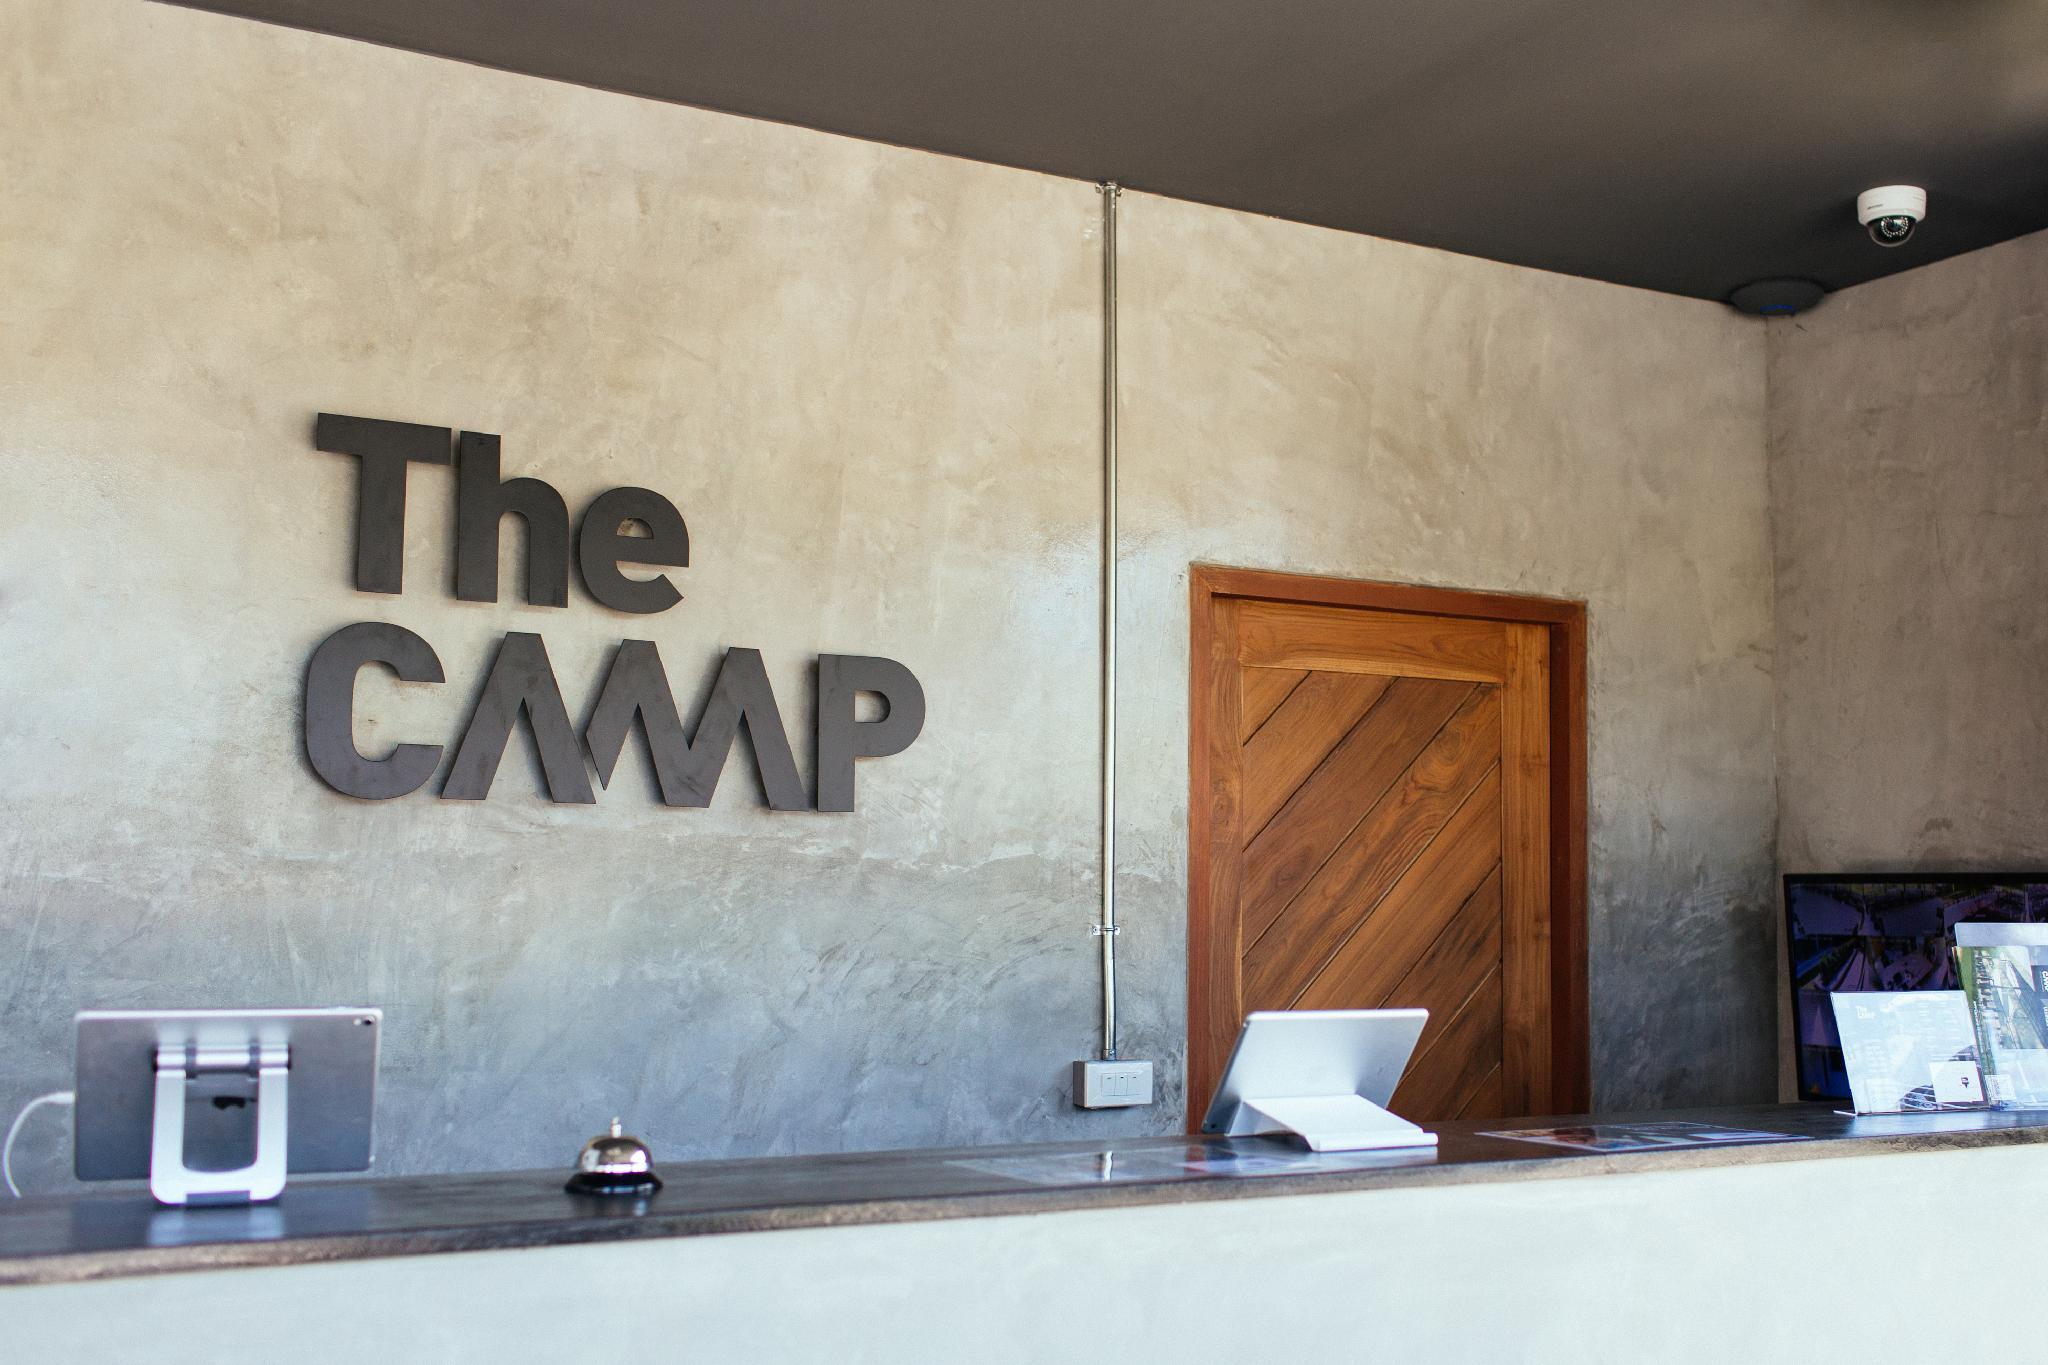 The Camp Muay Thai Resort and Academy,เดอะ แคมป์ มวยไทย รีสอร์ต แอนด์ อคาเดมี